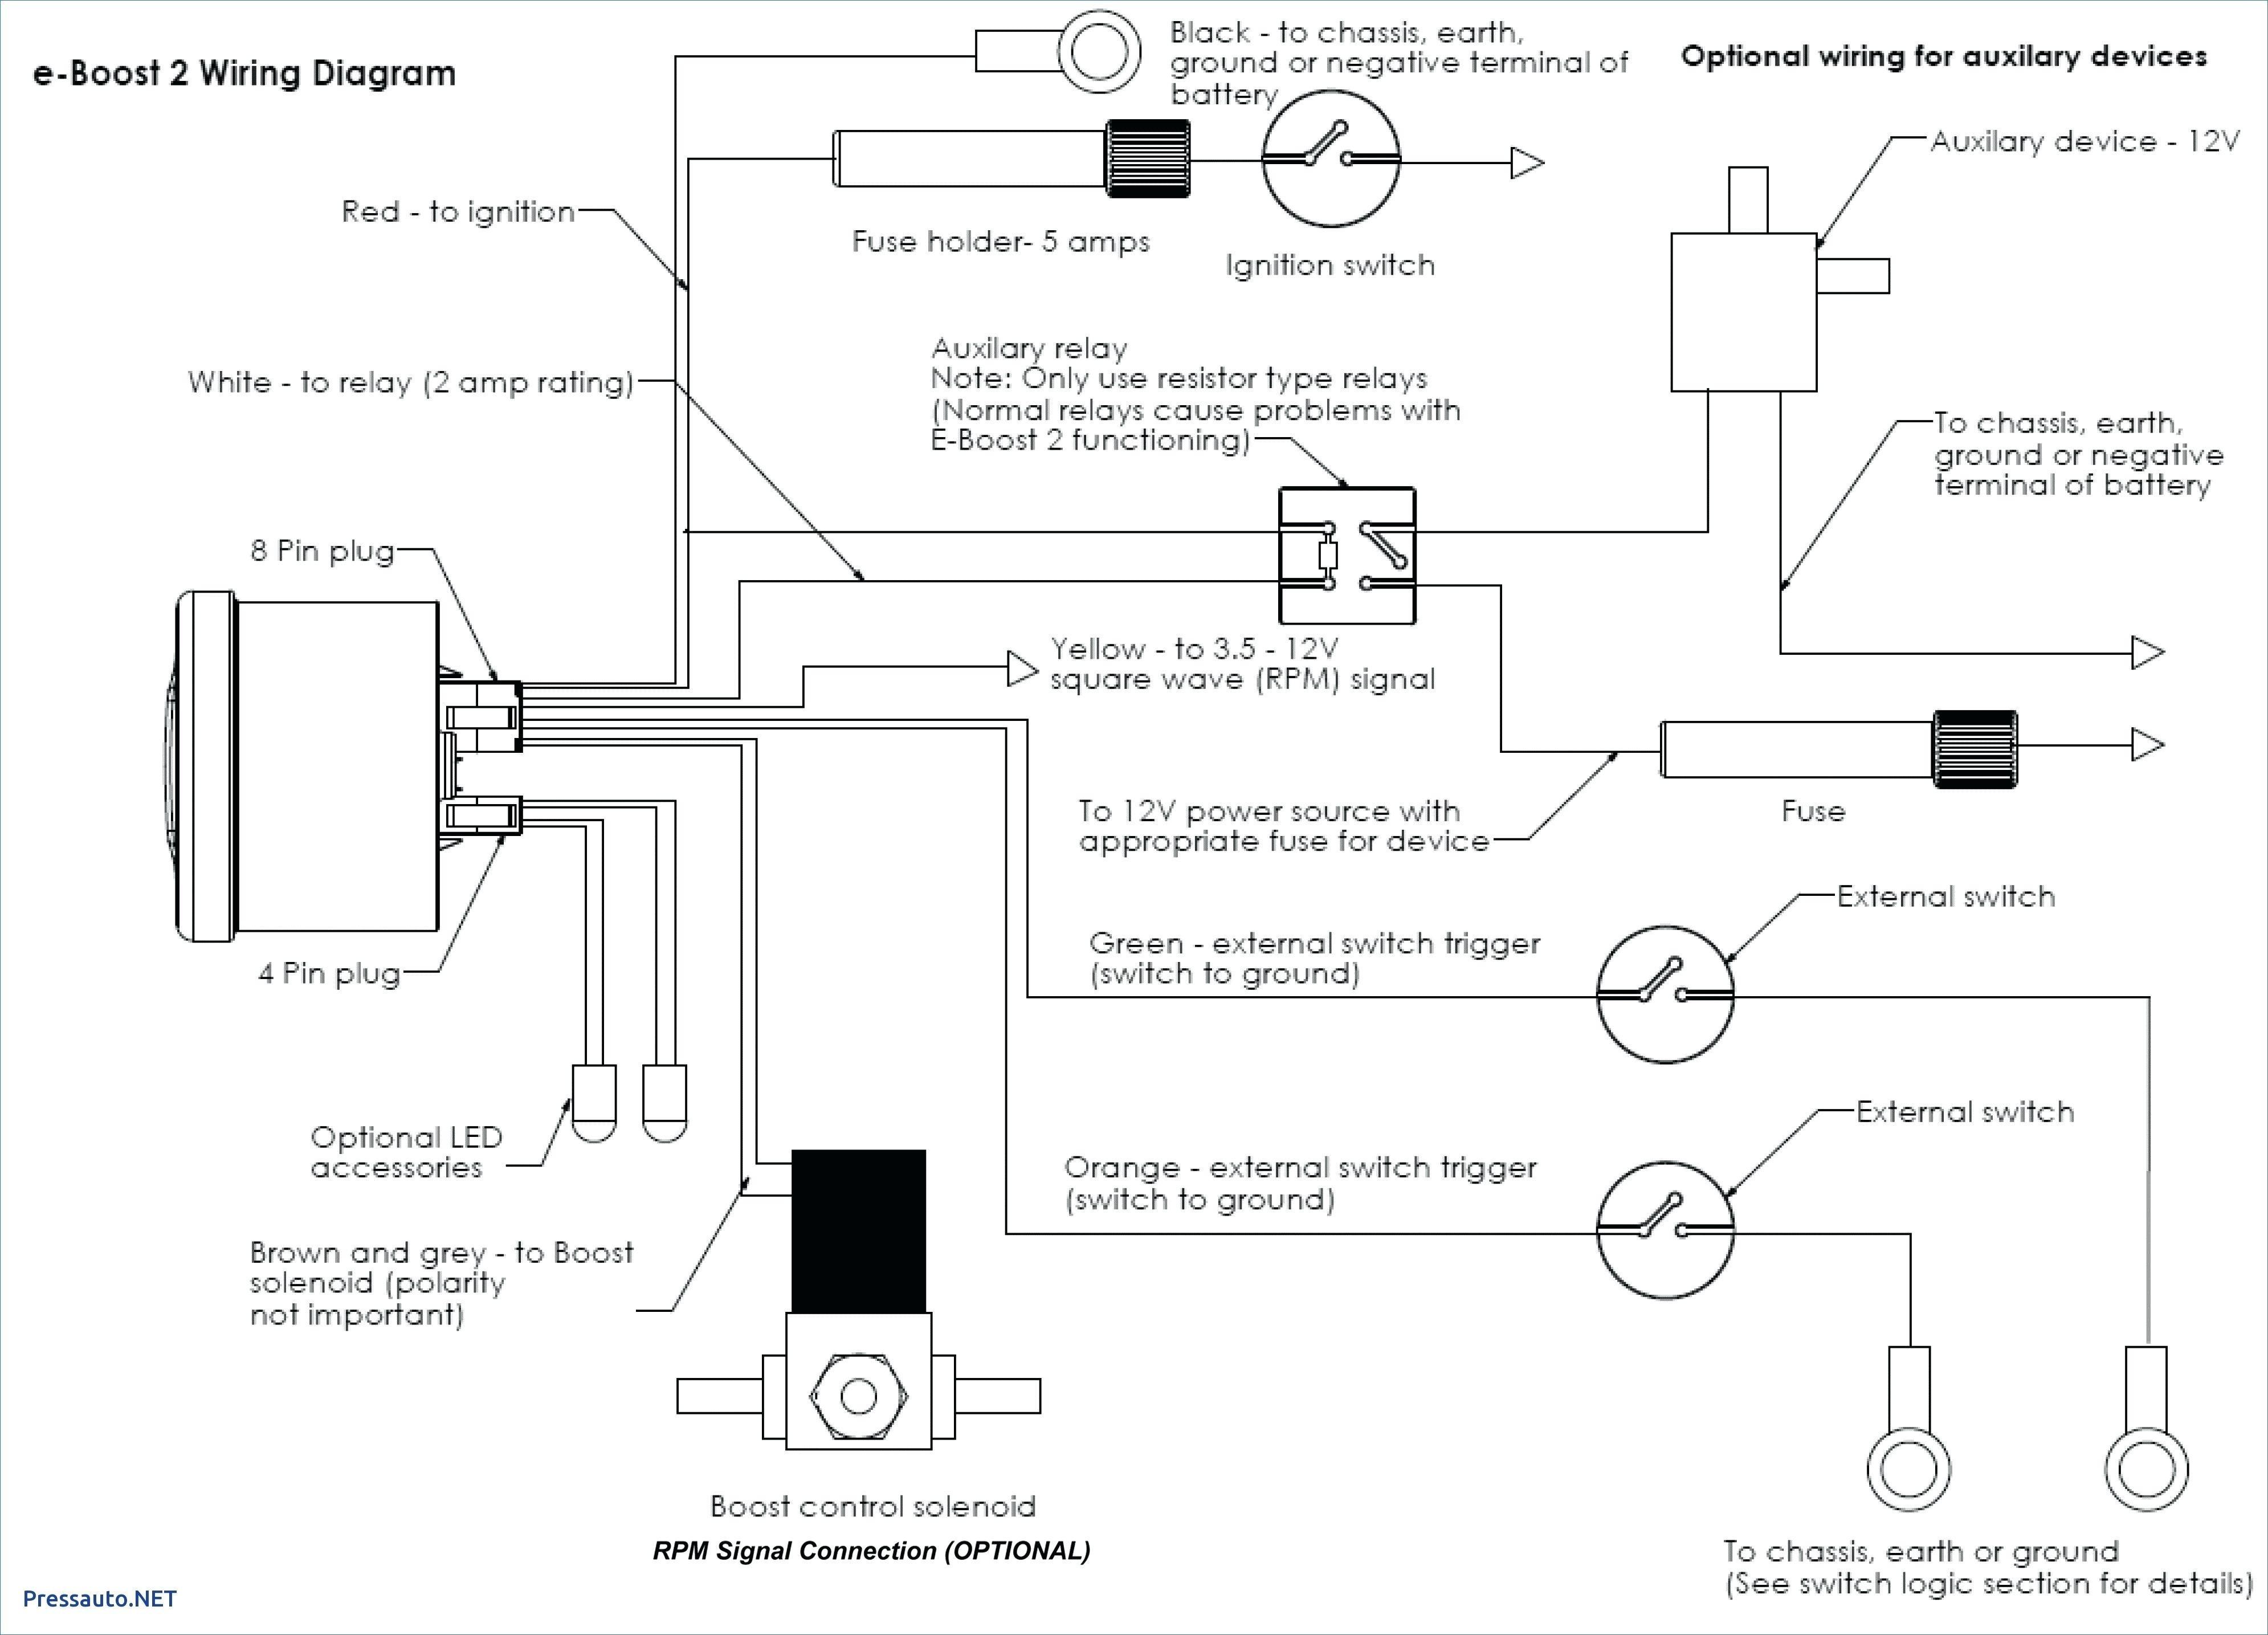 Massey Ferguson 135 Wiring Diagram Generator Refrence Massey Ferguson 135 Wiring Diagram Alternator New Massey Ferguson